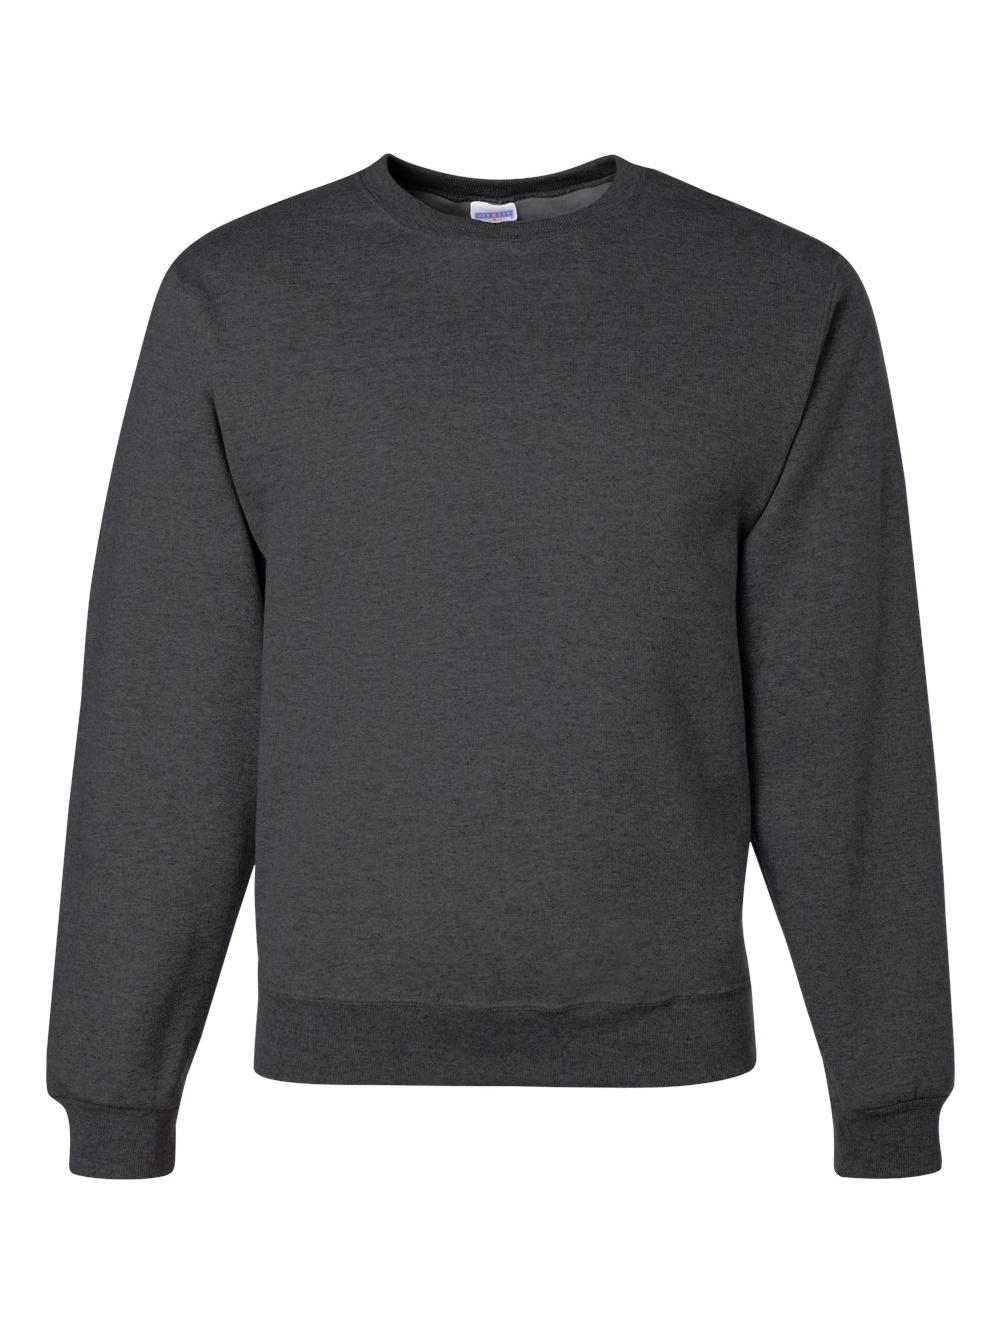 Jerzees-NuBlend-Crewneck-Sweatshirt-562MR thumbnail 12